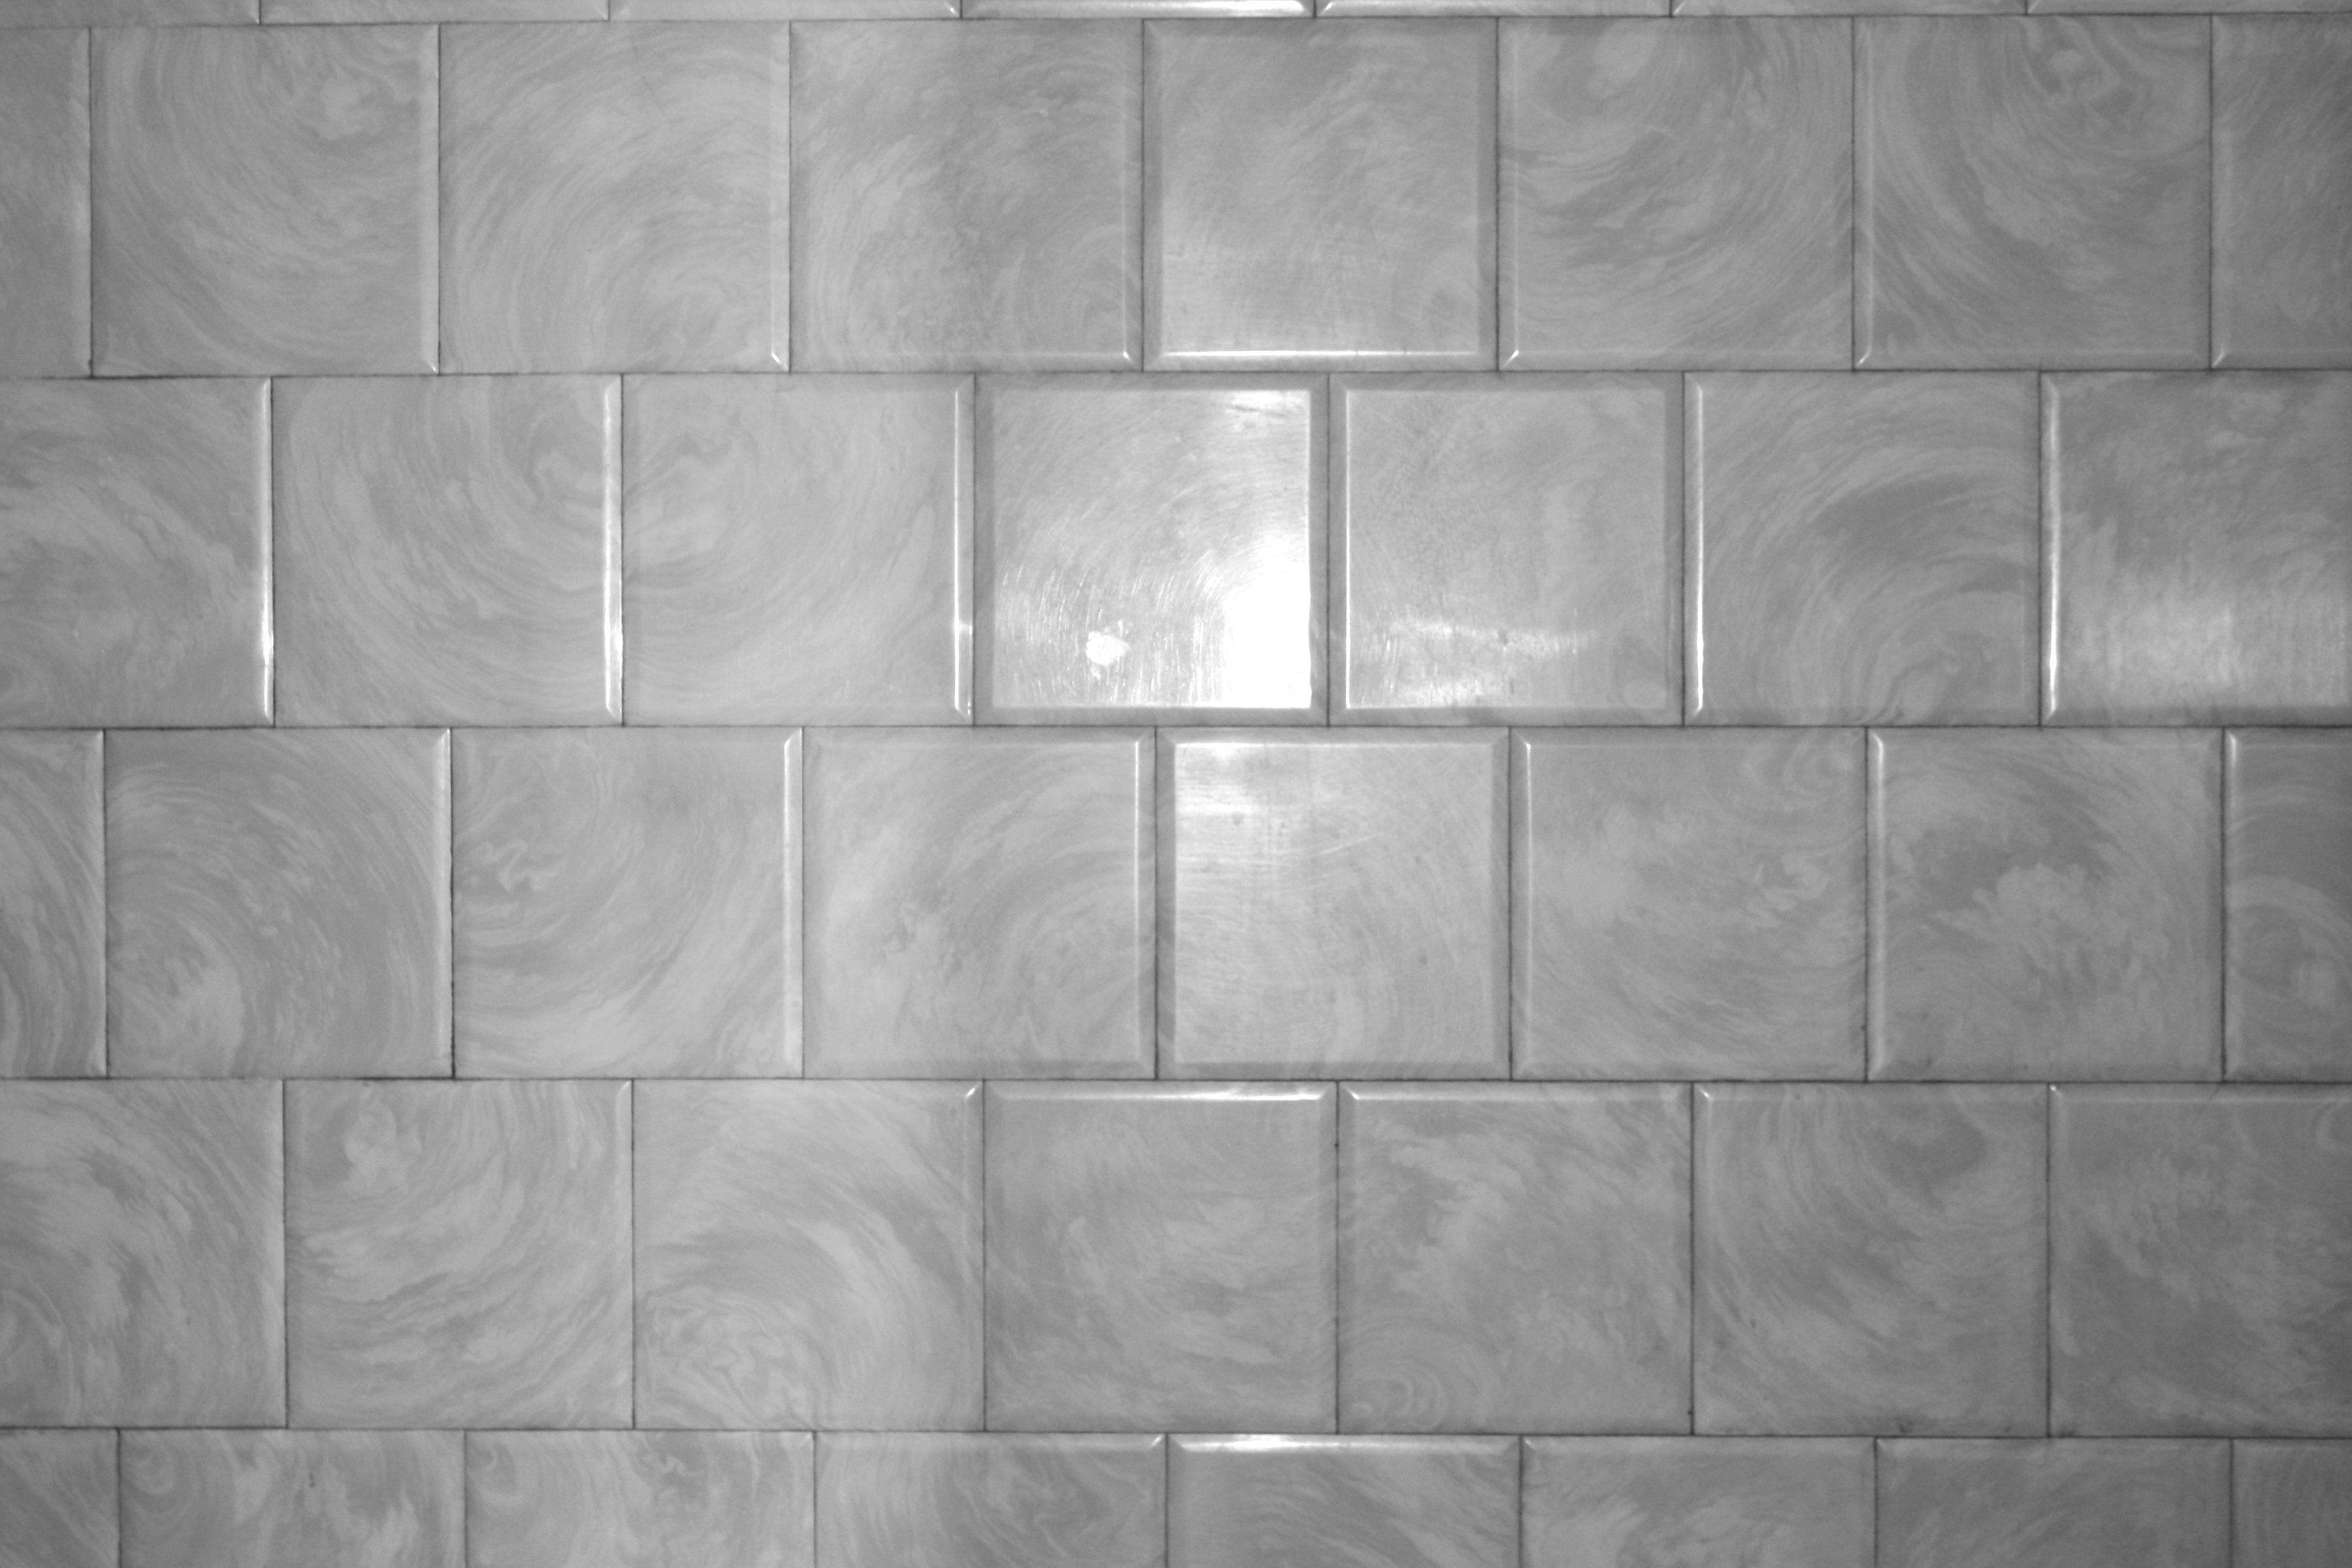 Grey bathroom gray bathroom tile with swirl pattern - Grey bathroom floor tiles texture ...